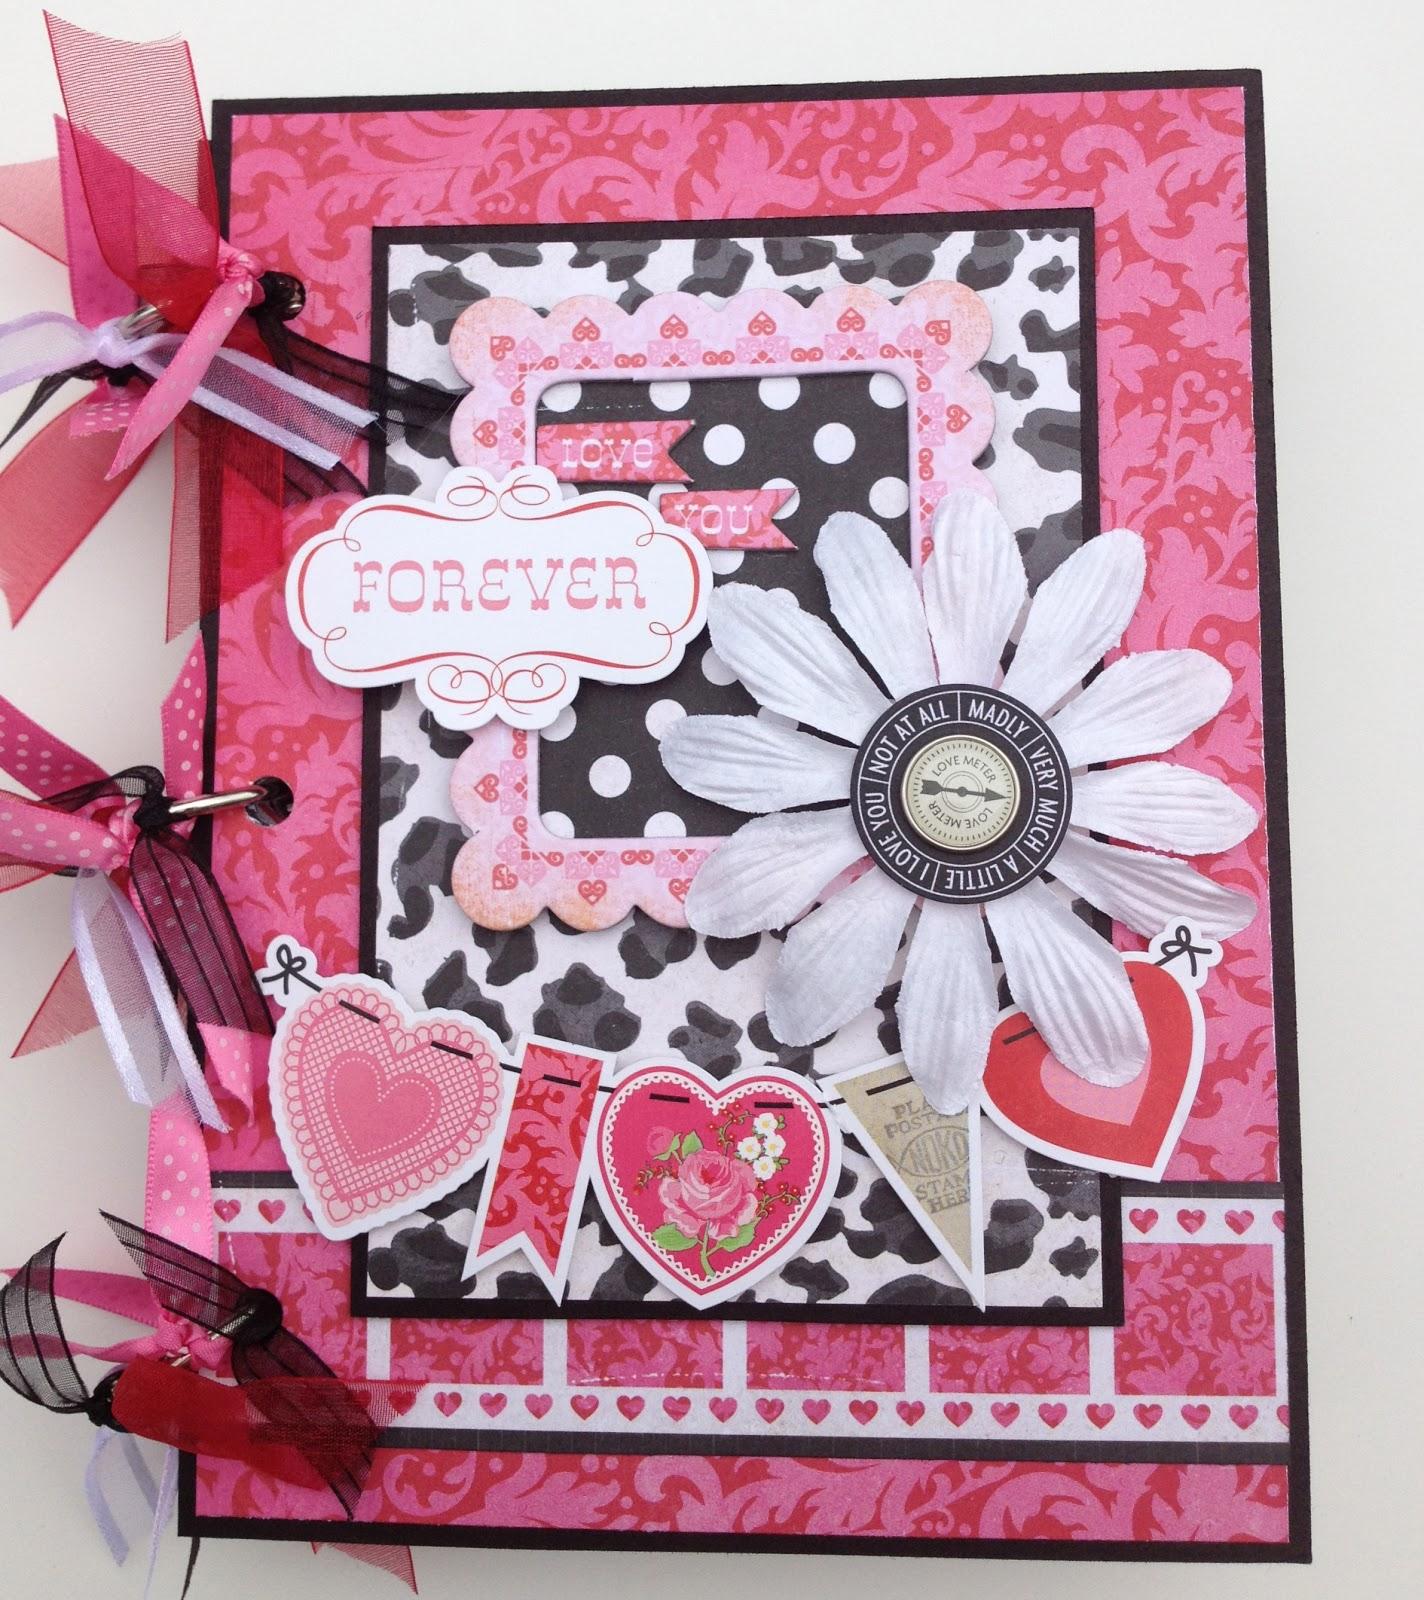 Scrapbook ideas and designs - Thursday February 14 2013